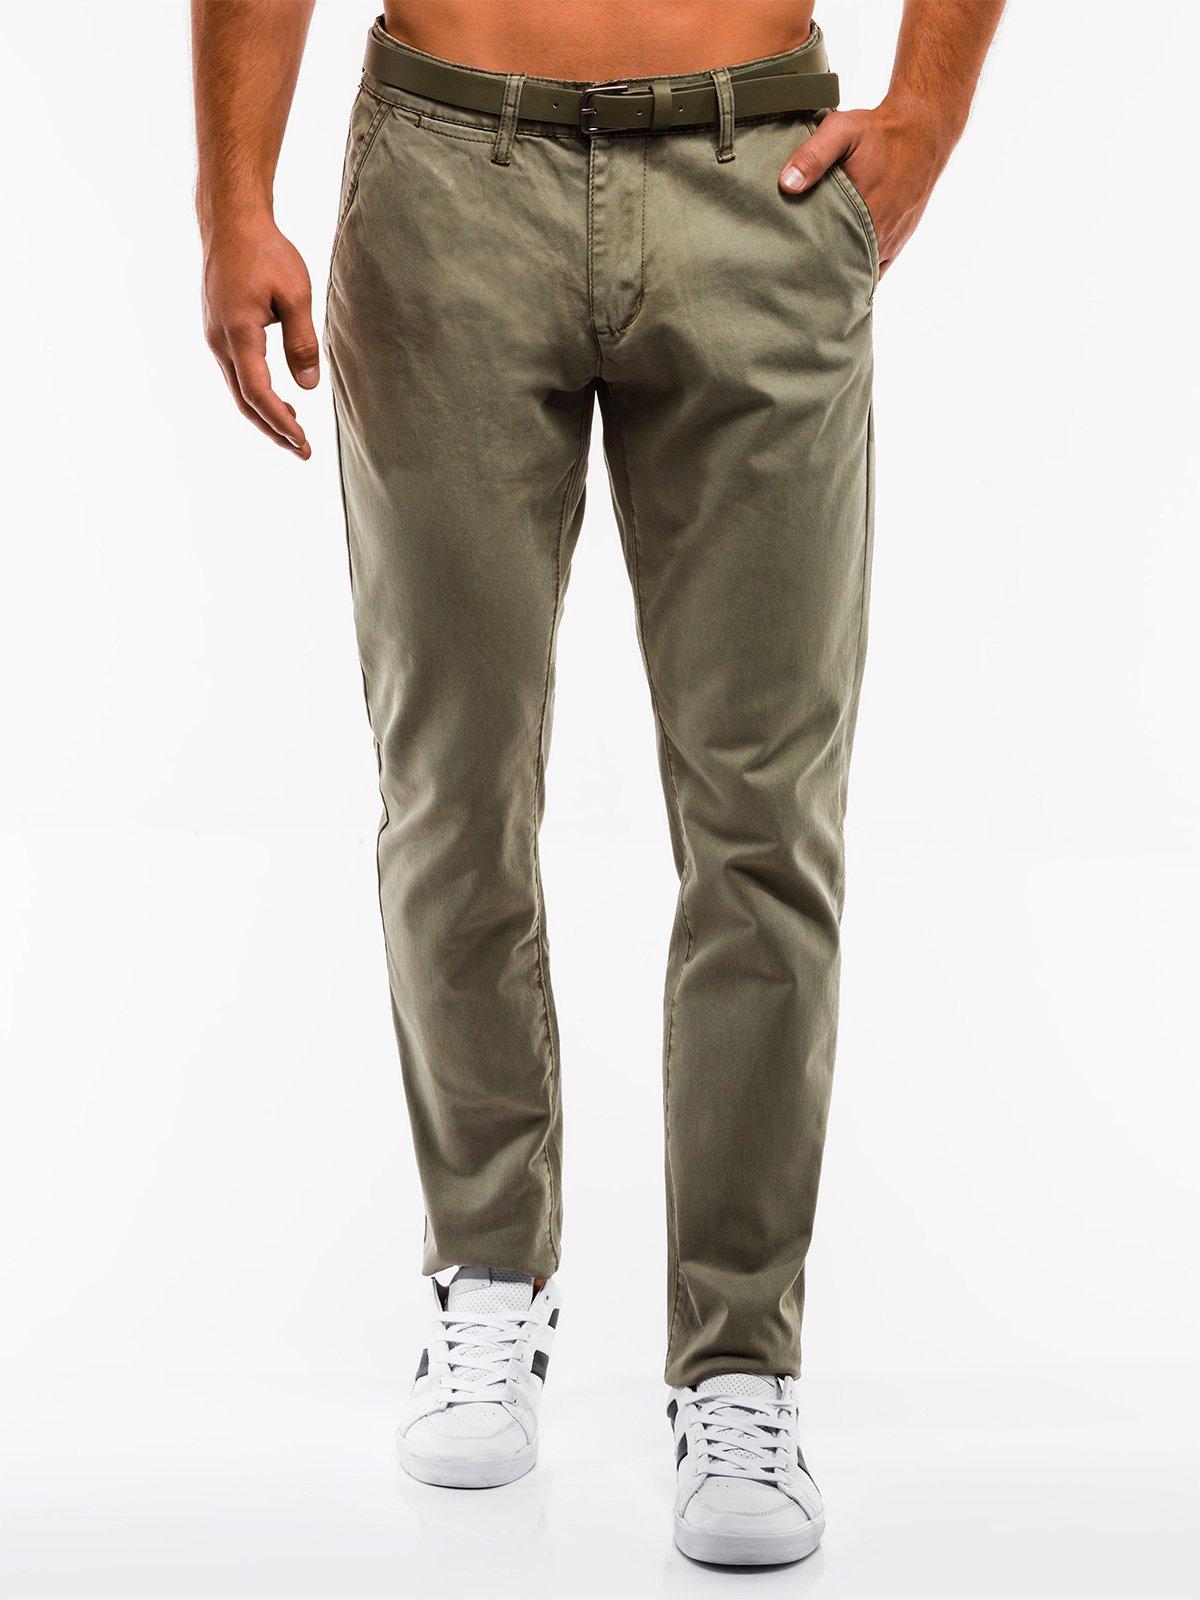 Spodnie męskie chino 837P khaki